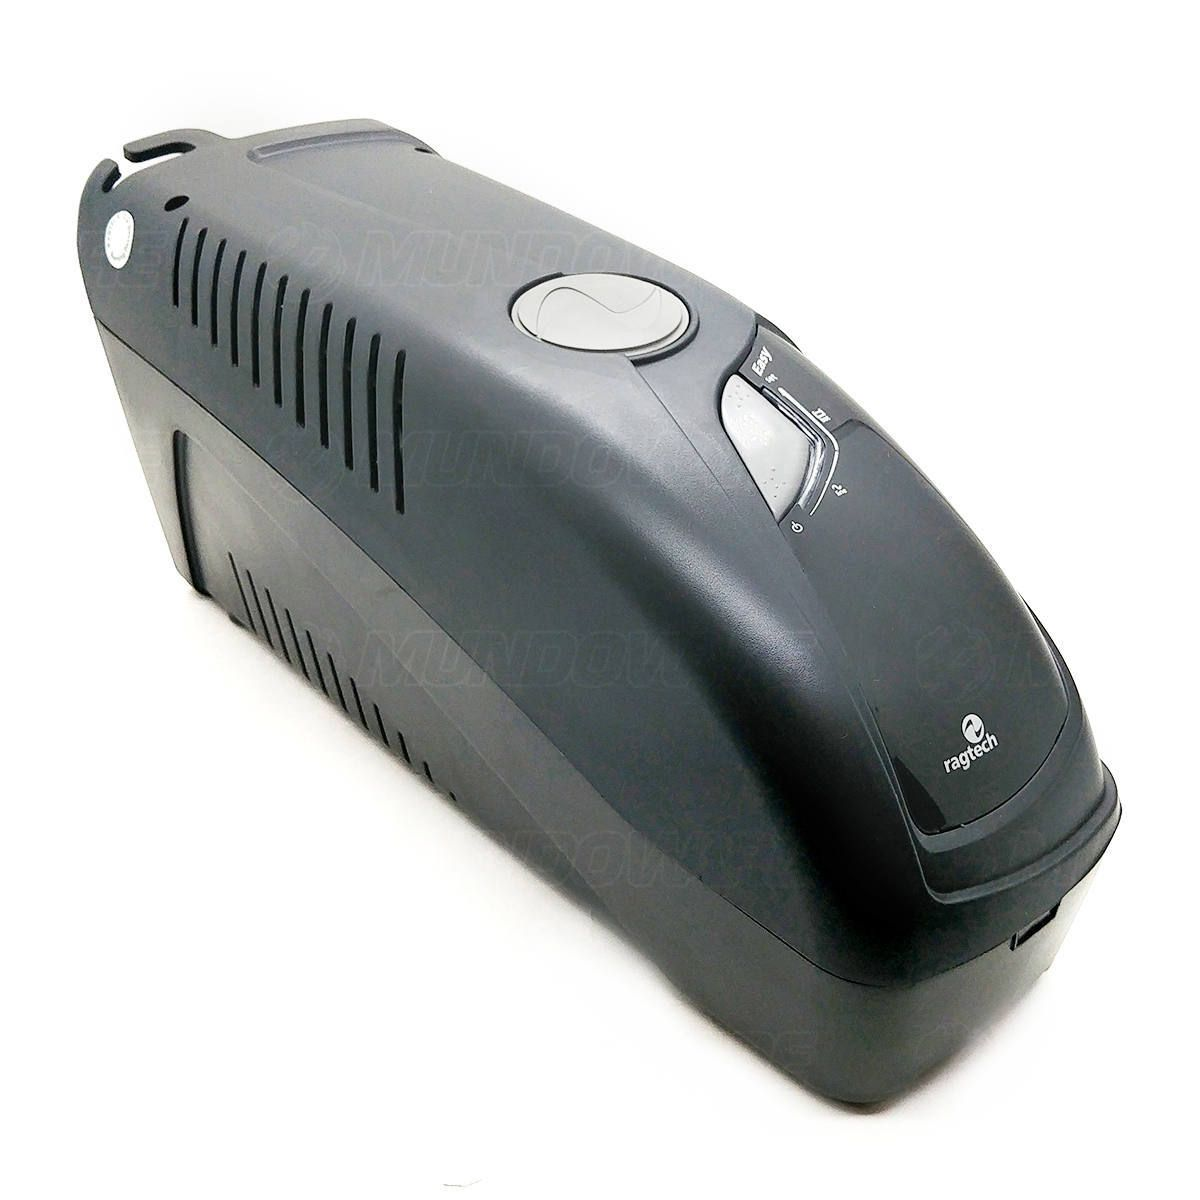 Nobreak 1400VA 980W 6 Tomadas 3 em 1 Engate para Bateria Externa Trivolt PWM Troca Fácil Ragtech GT CBU-TI 4154